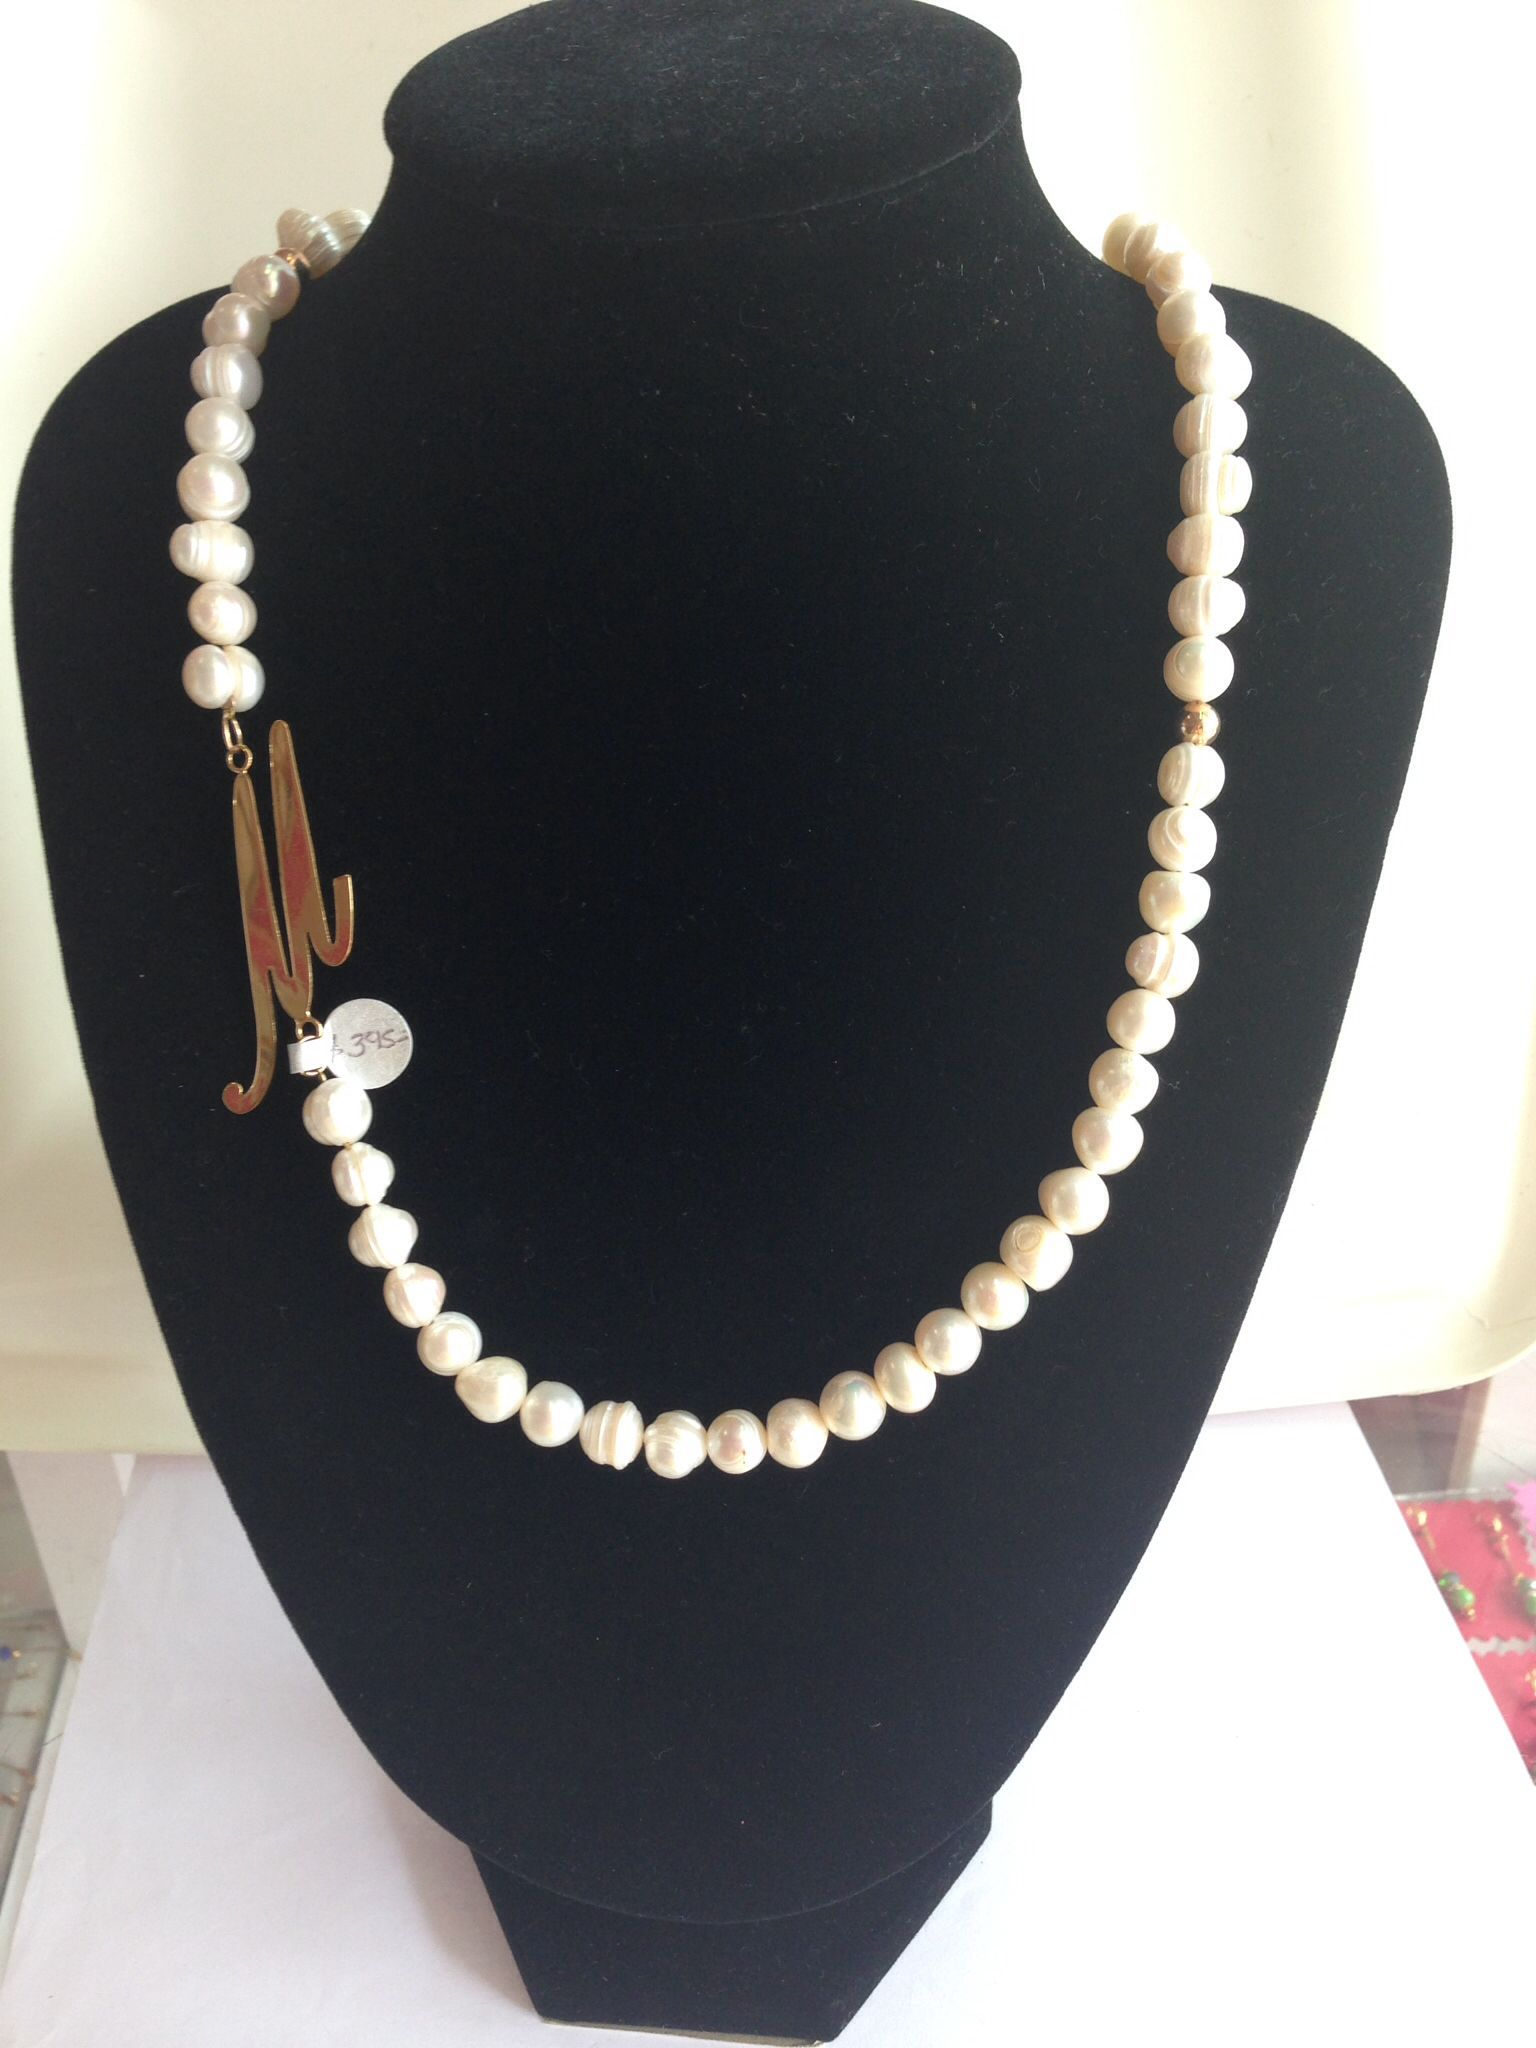 61565d0dfa21 Collar de perla de río con letra M